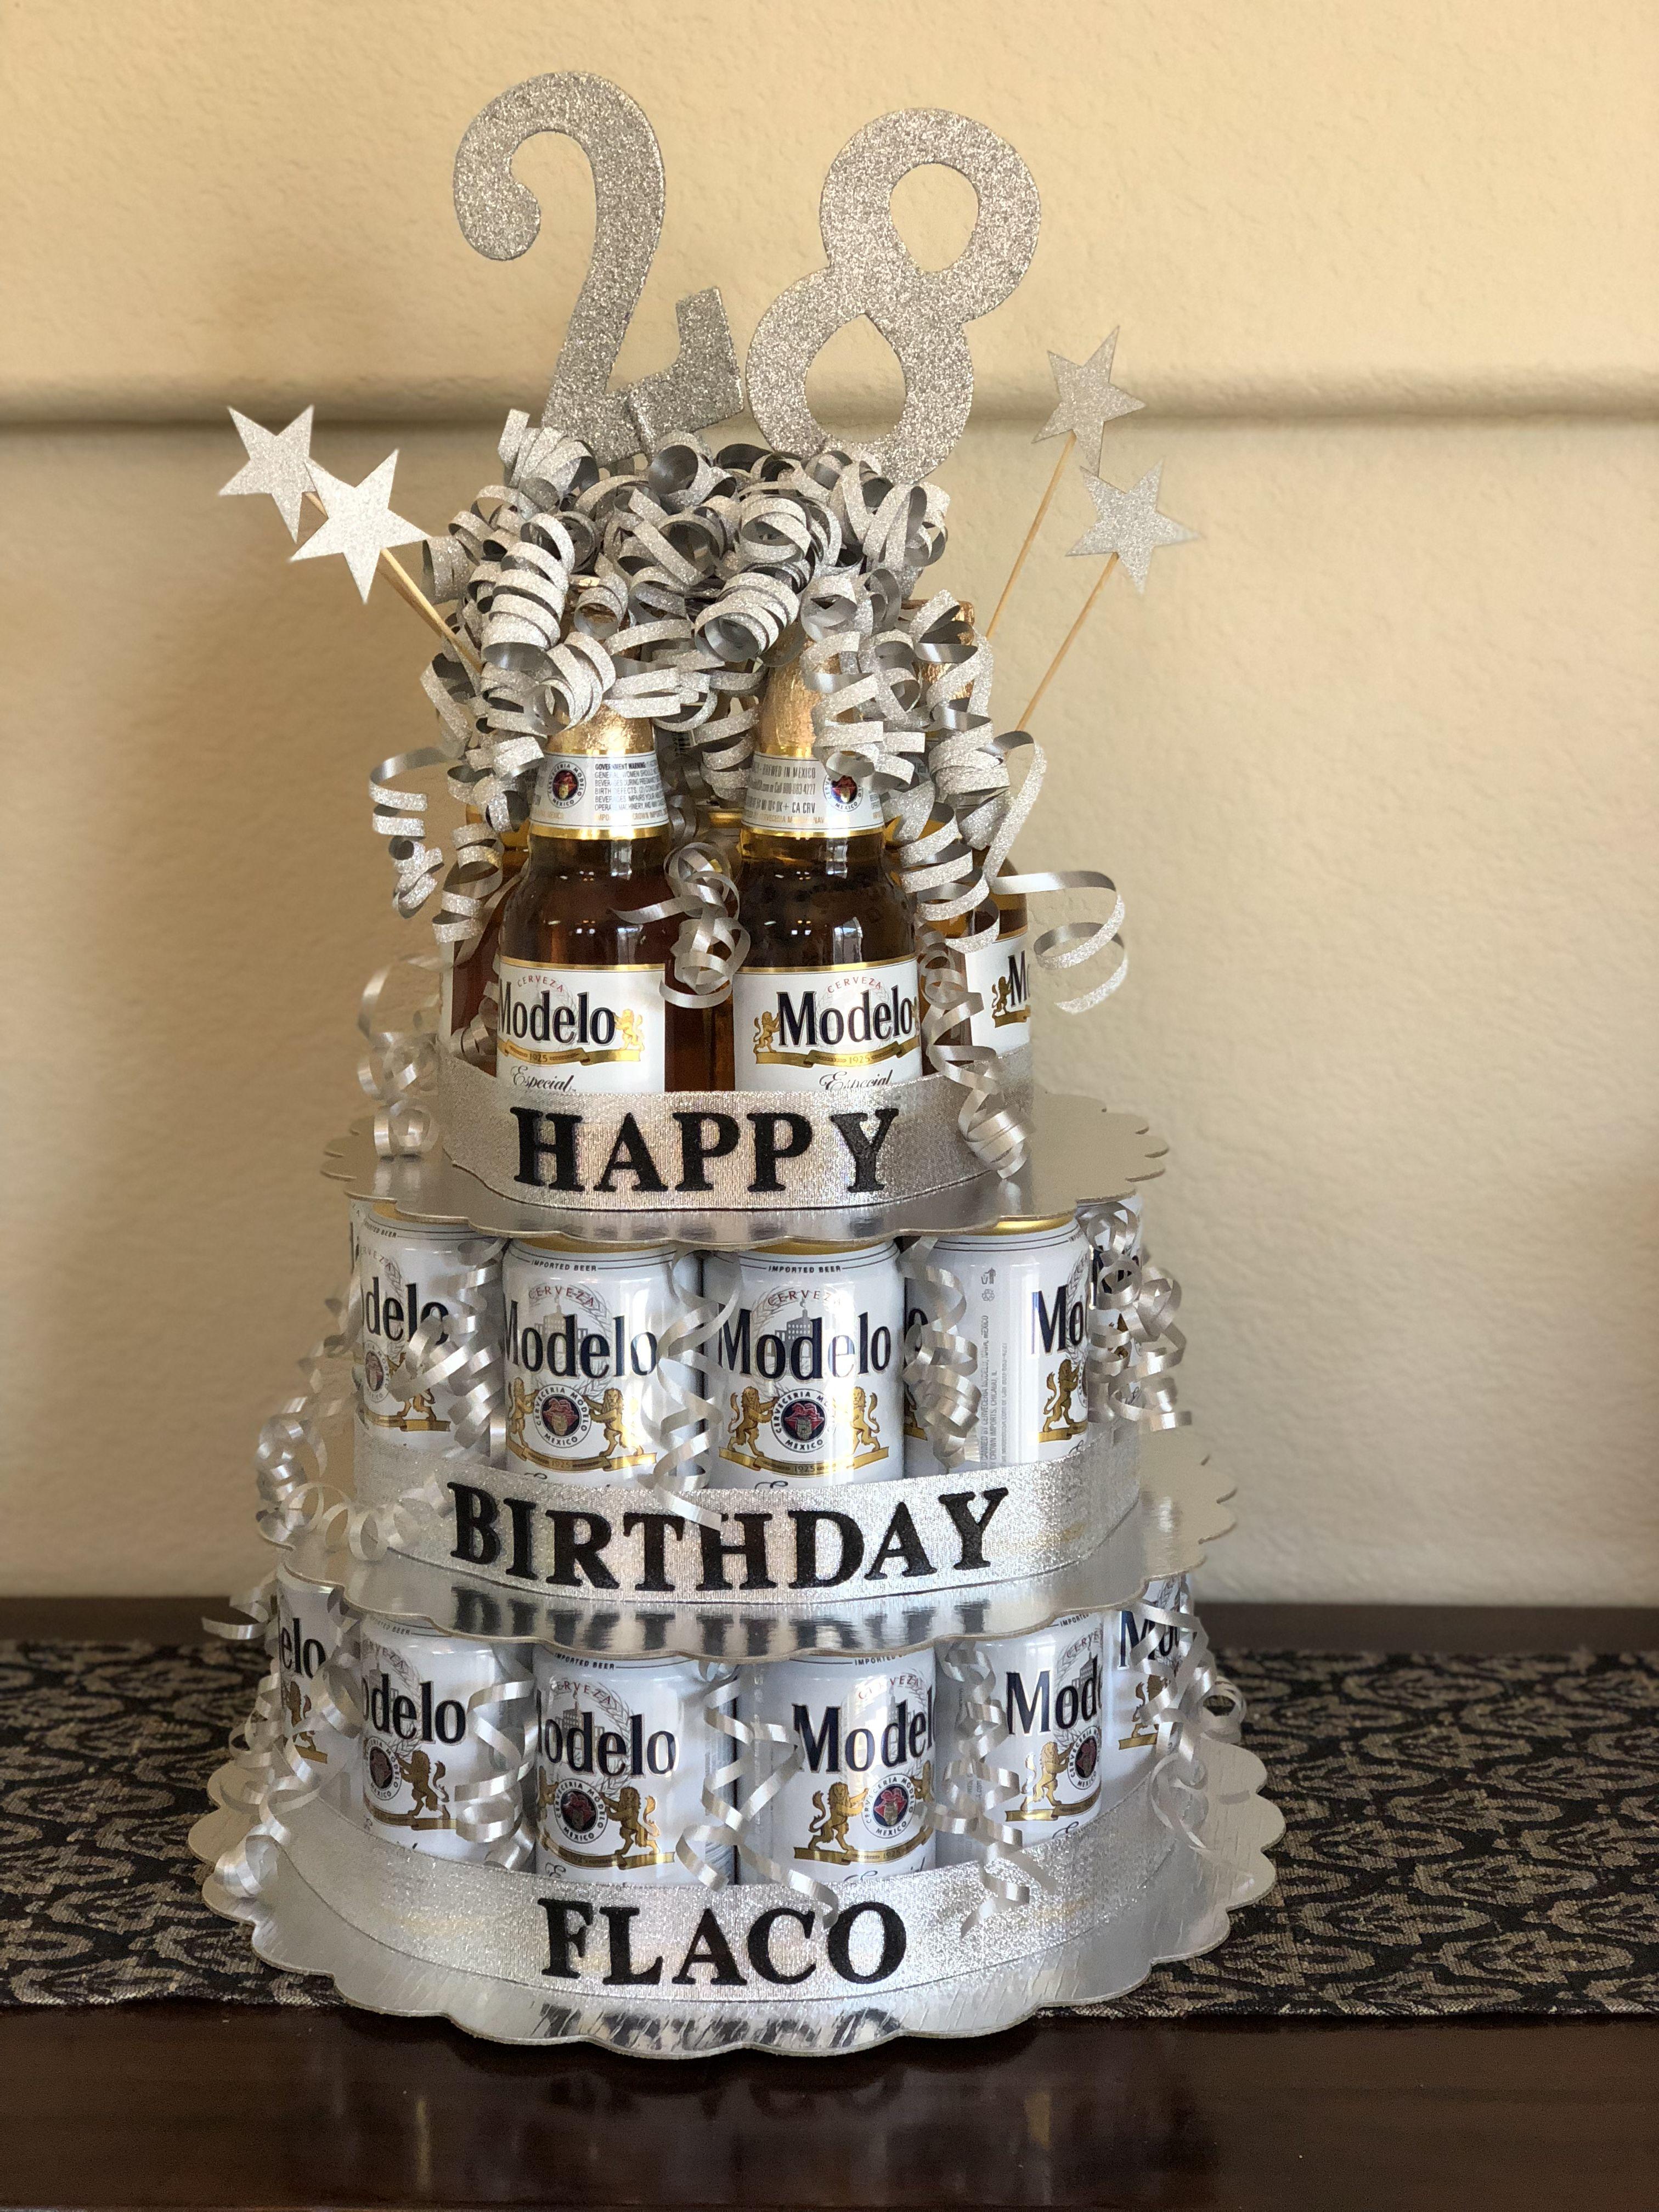 Modelo Beer Birthday Cake Diy Beer Birthday Party